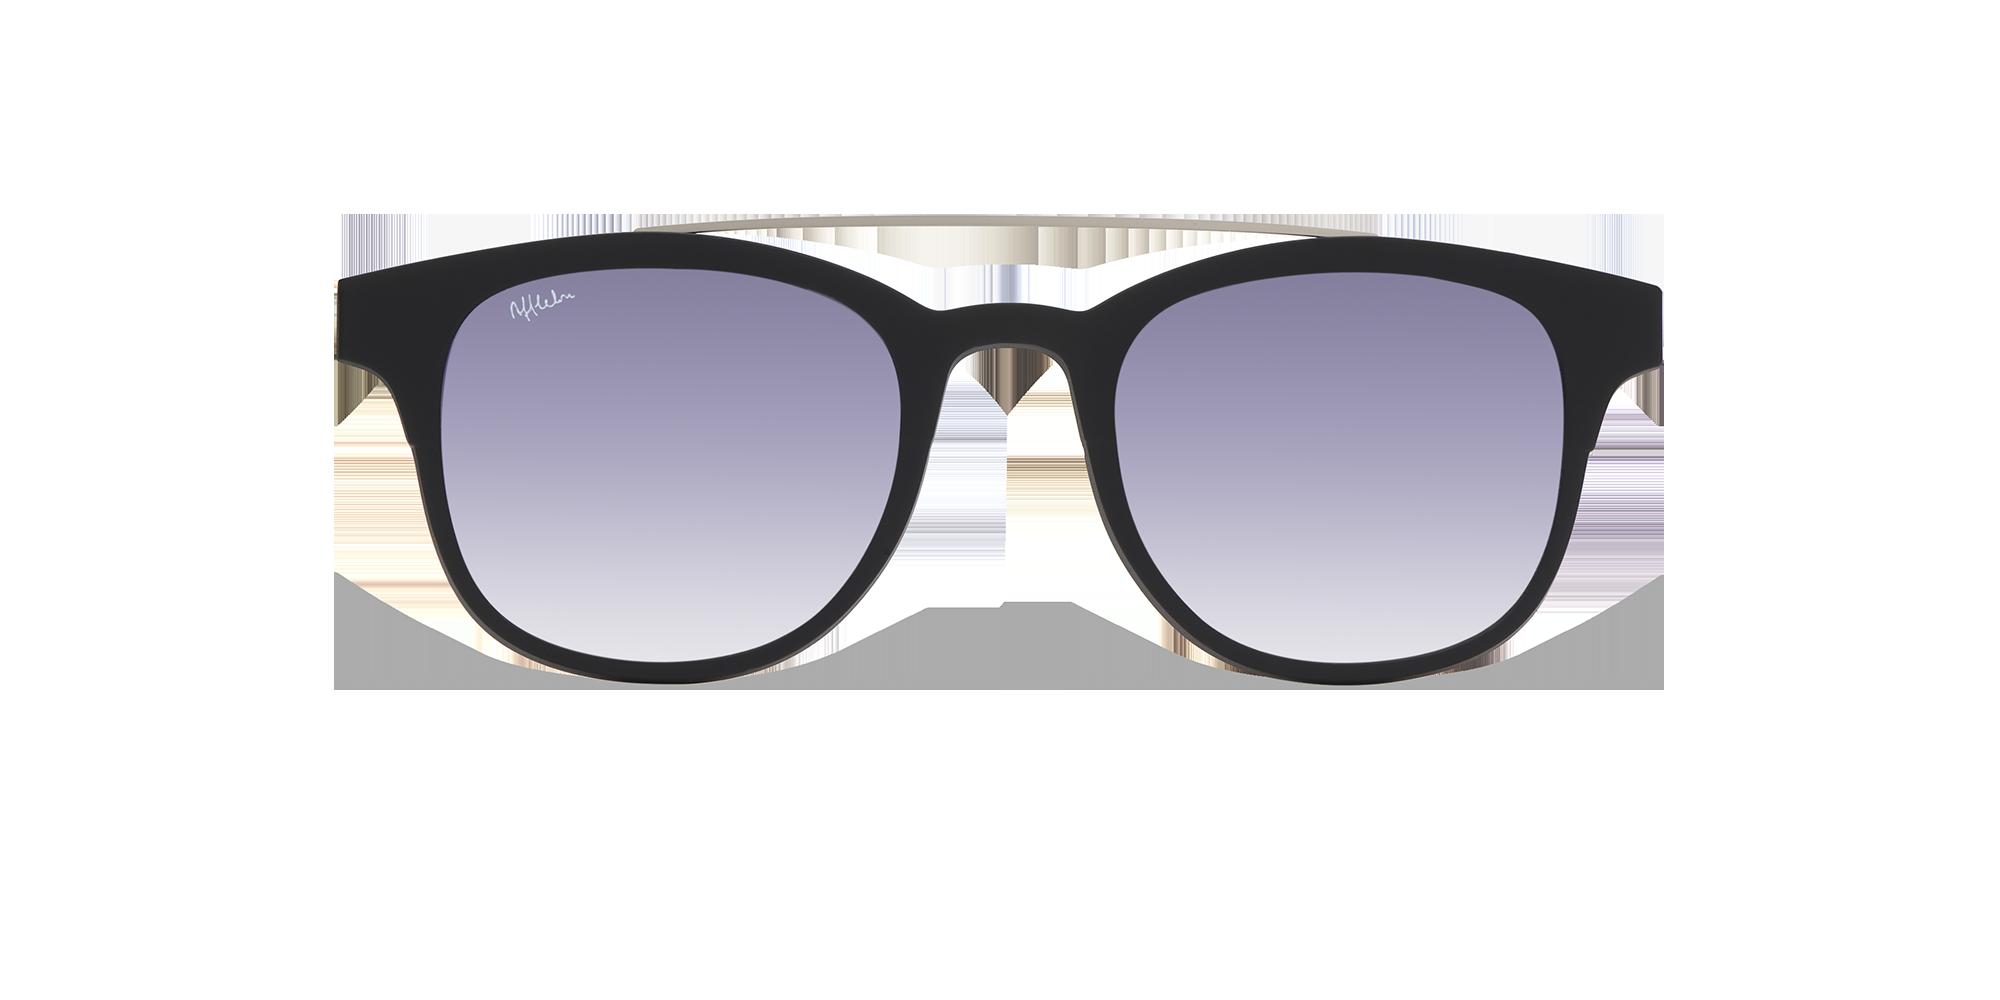 afflelou/france/products/smart_clip/clips_glasses/TMK34TBBK015021.png